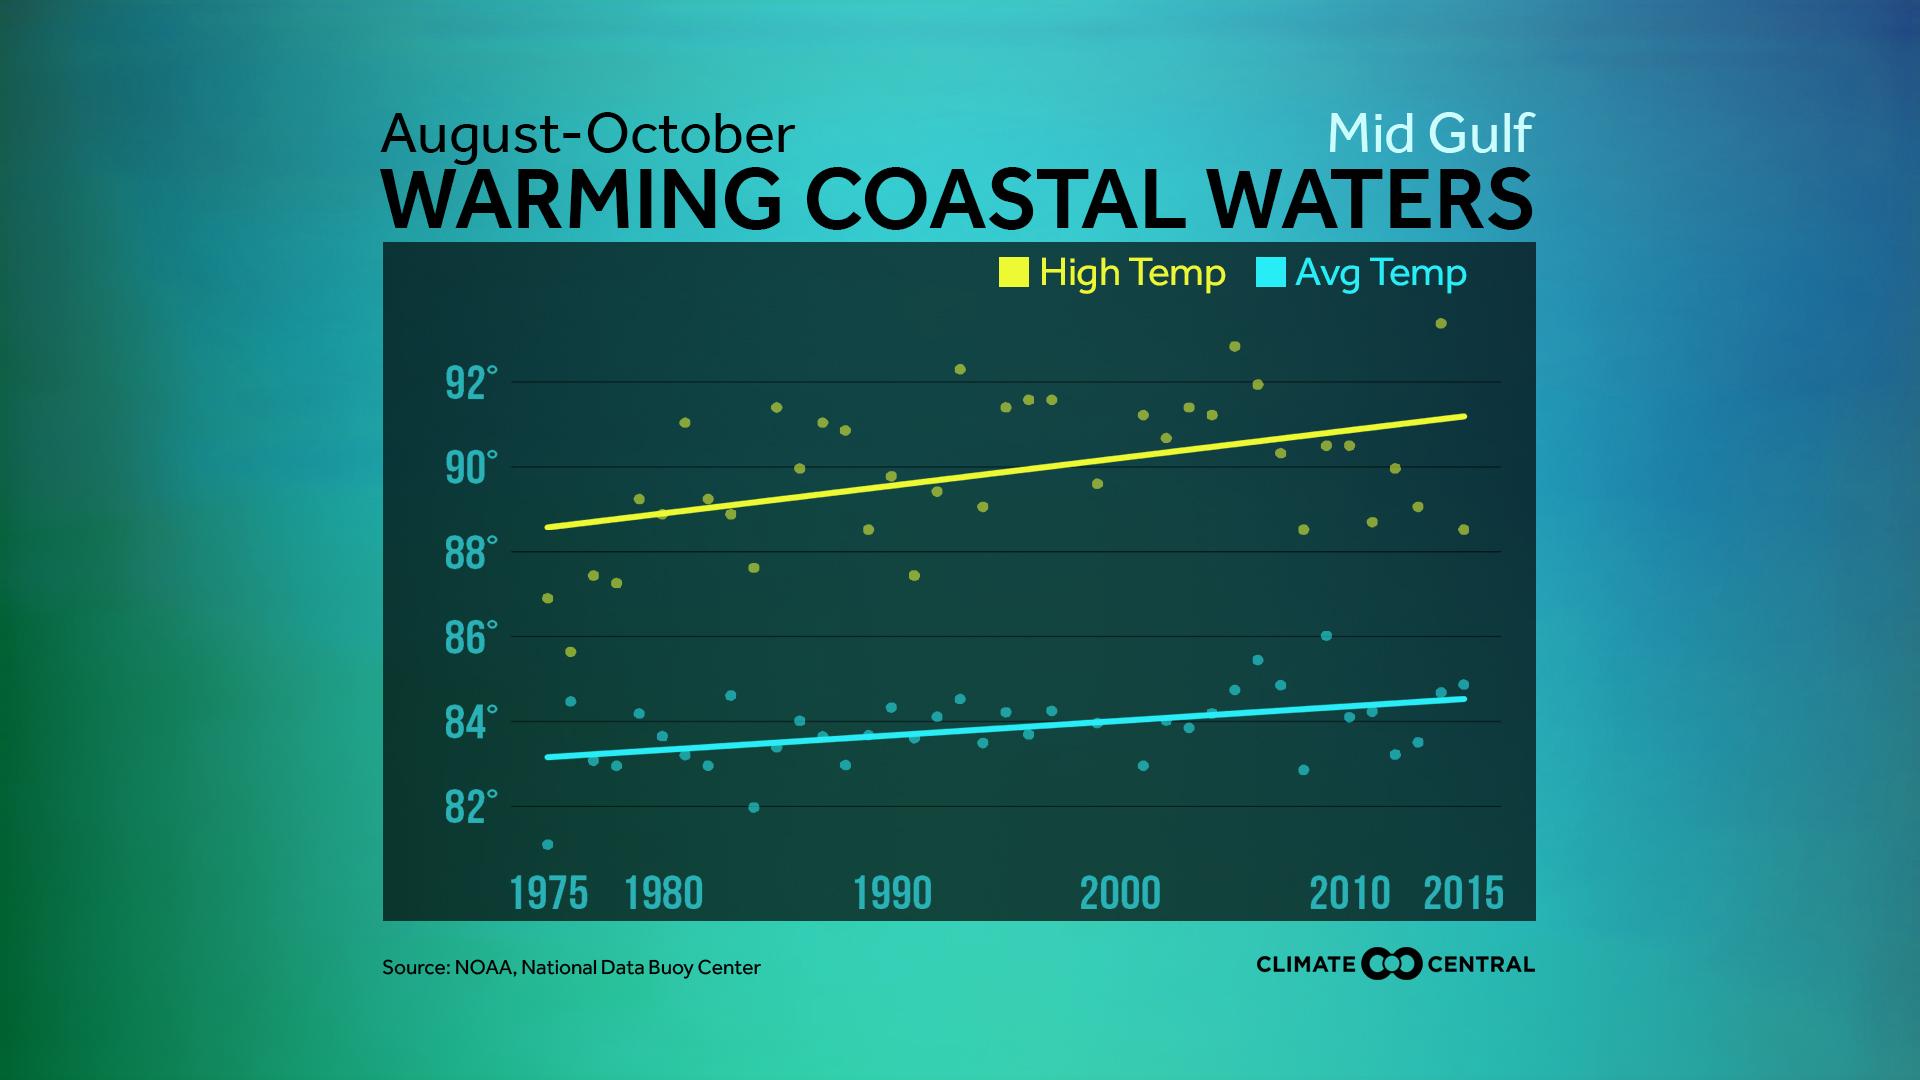 U.S. Coastal Water Temperature Trends